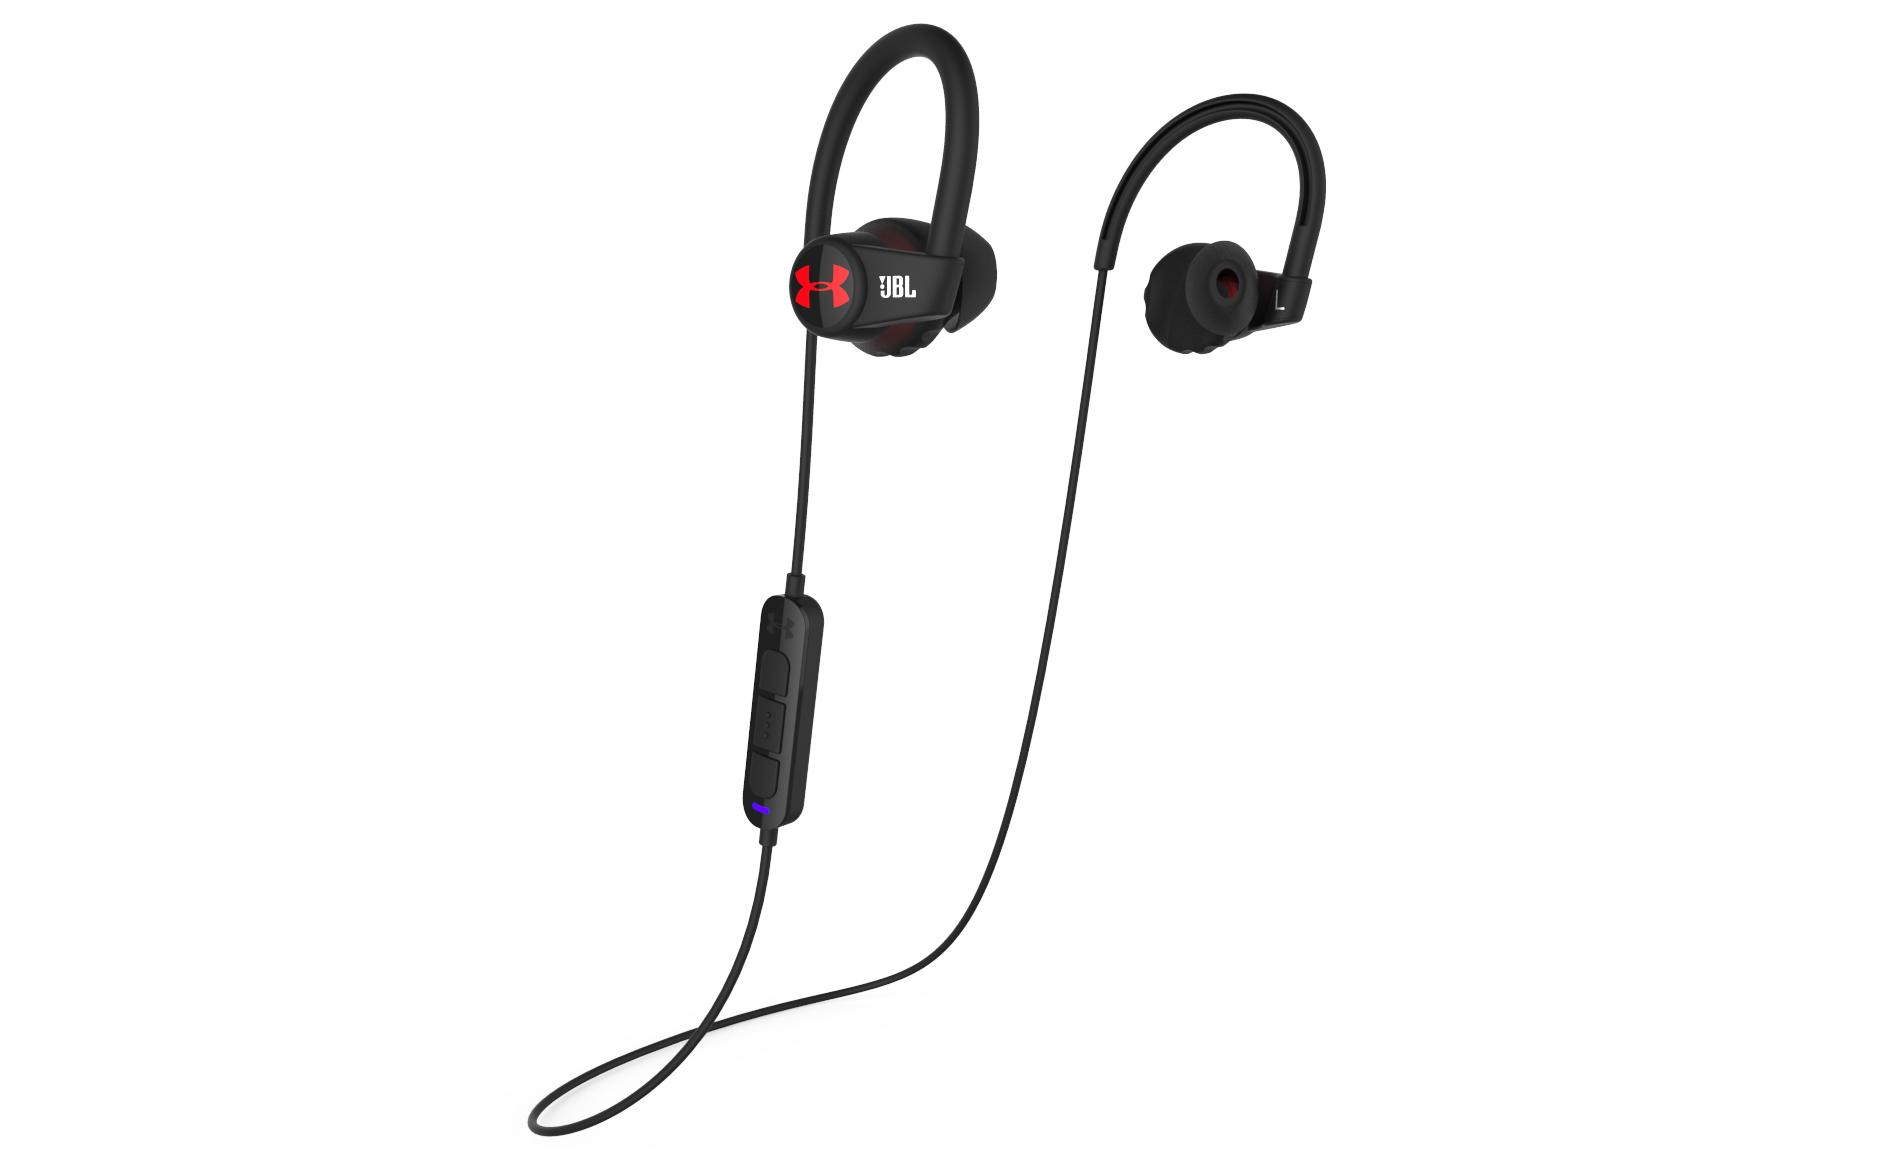 ua-headphones-wireless-heart-rate-by-jbl.jpg